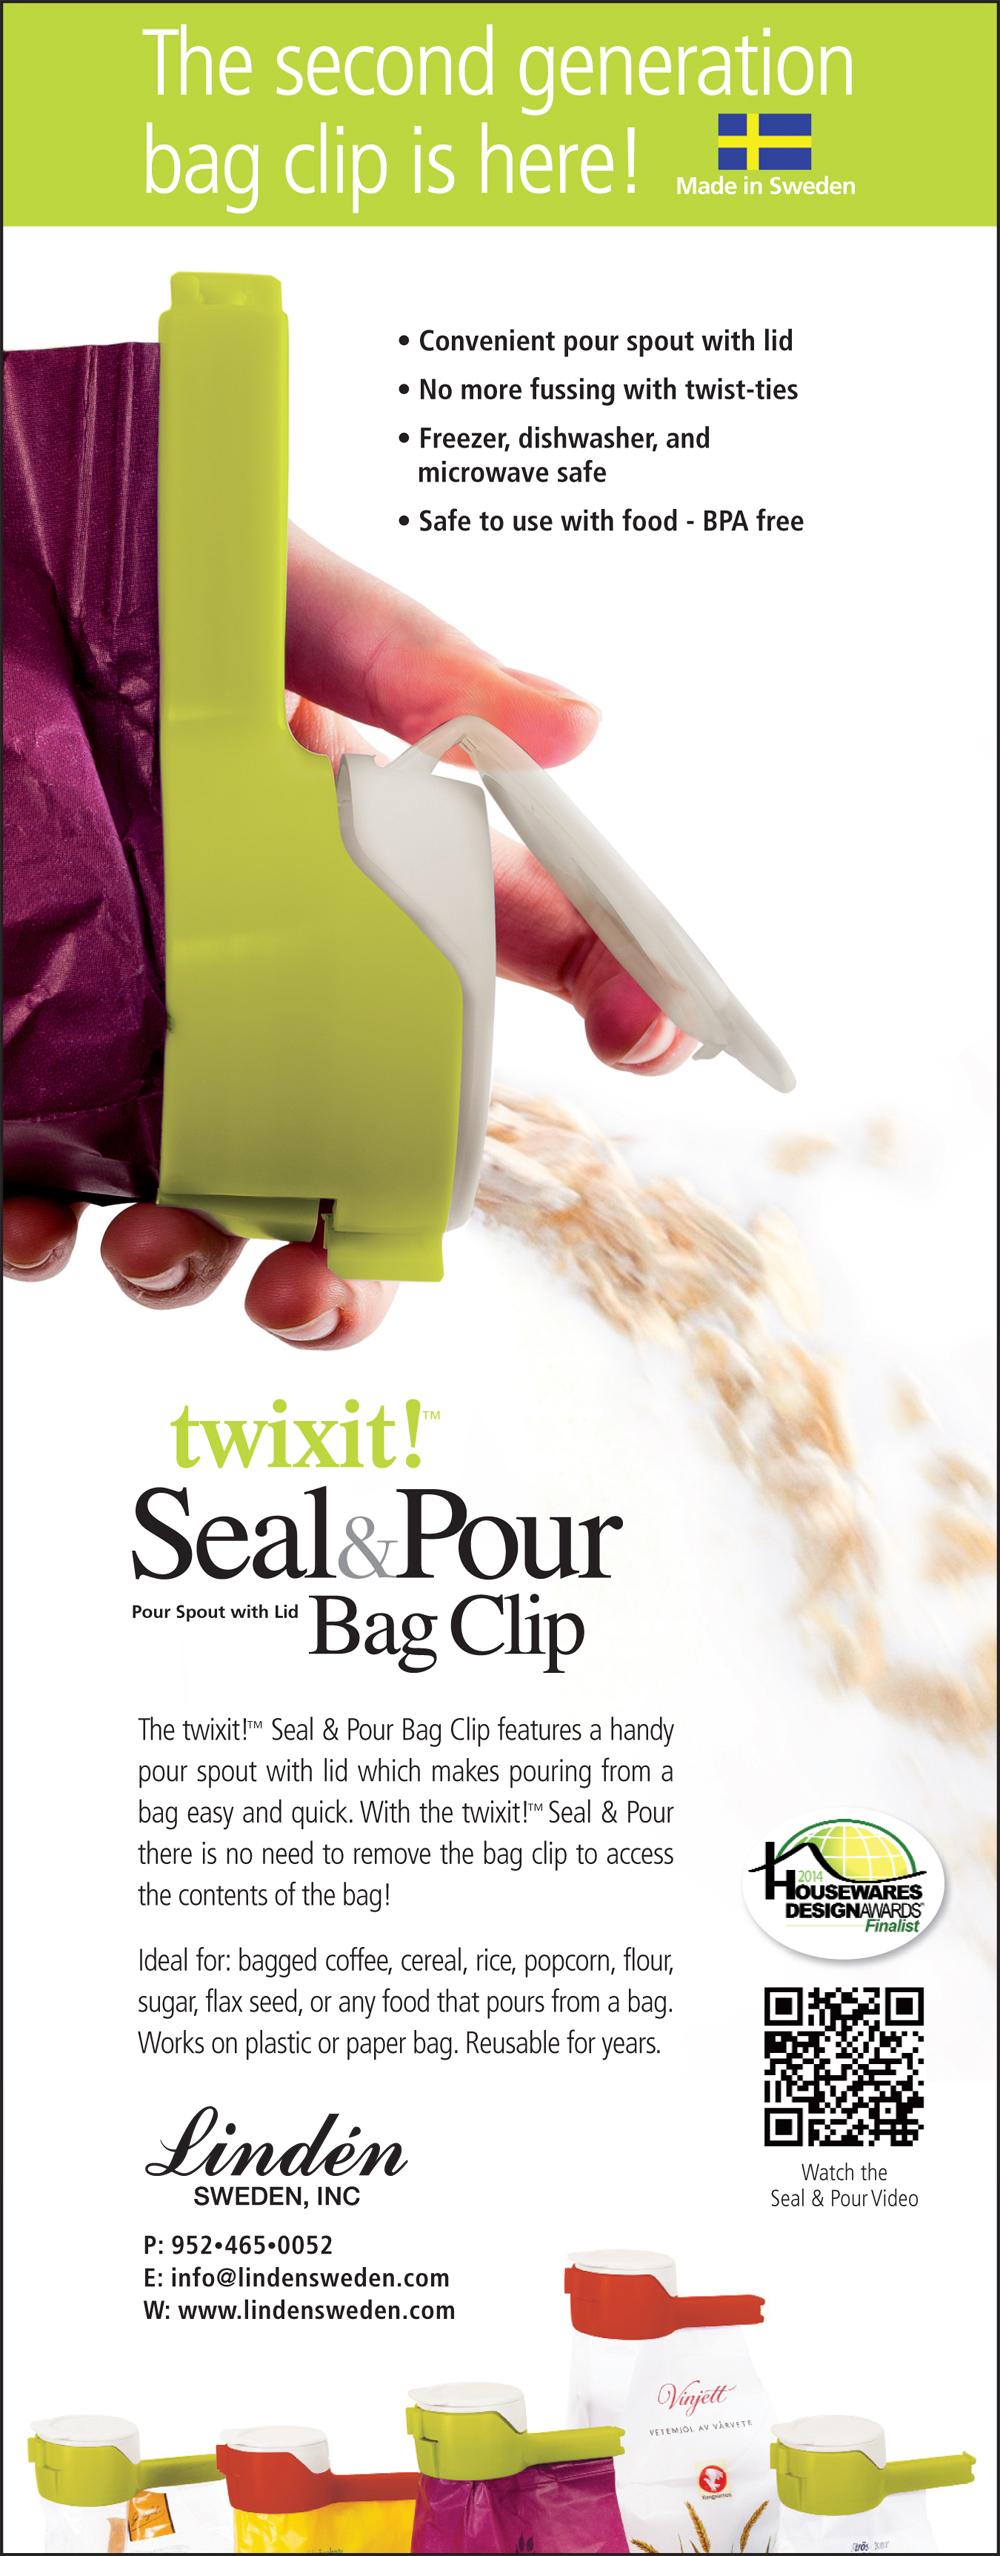 Seal&Pour Trade Pub.jpg